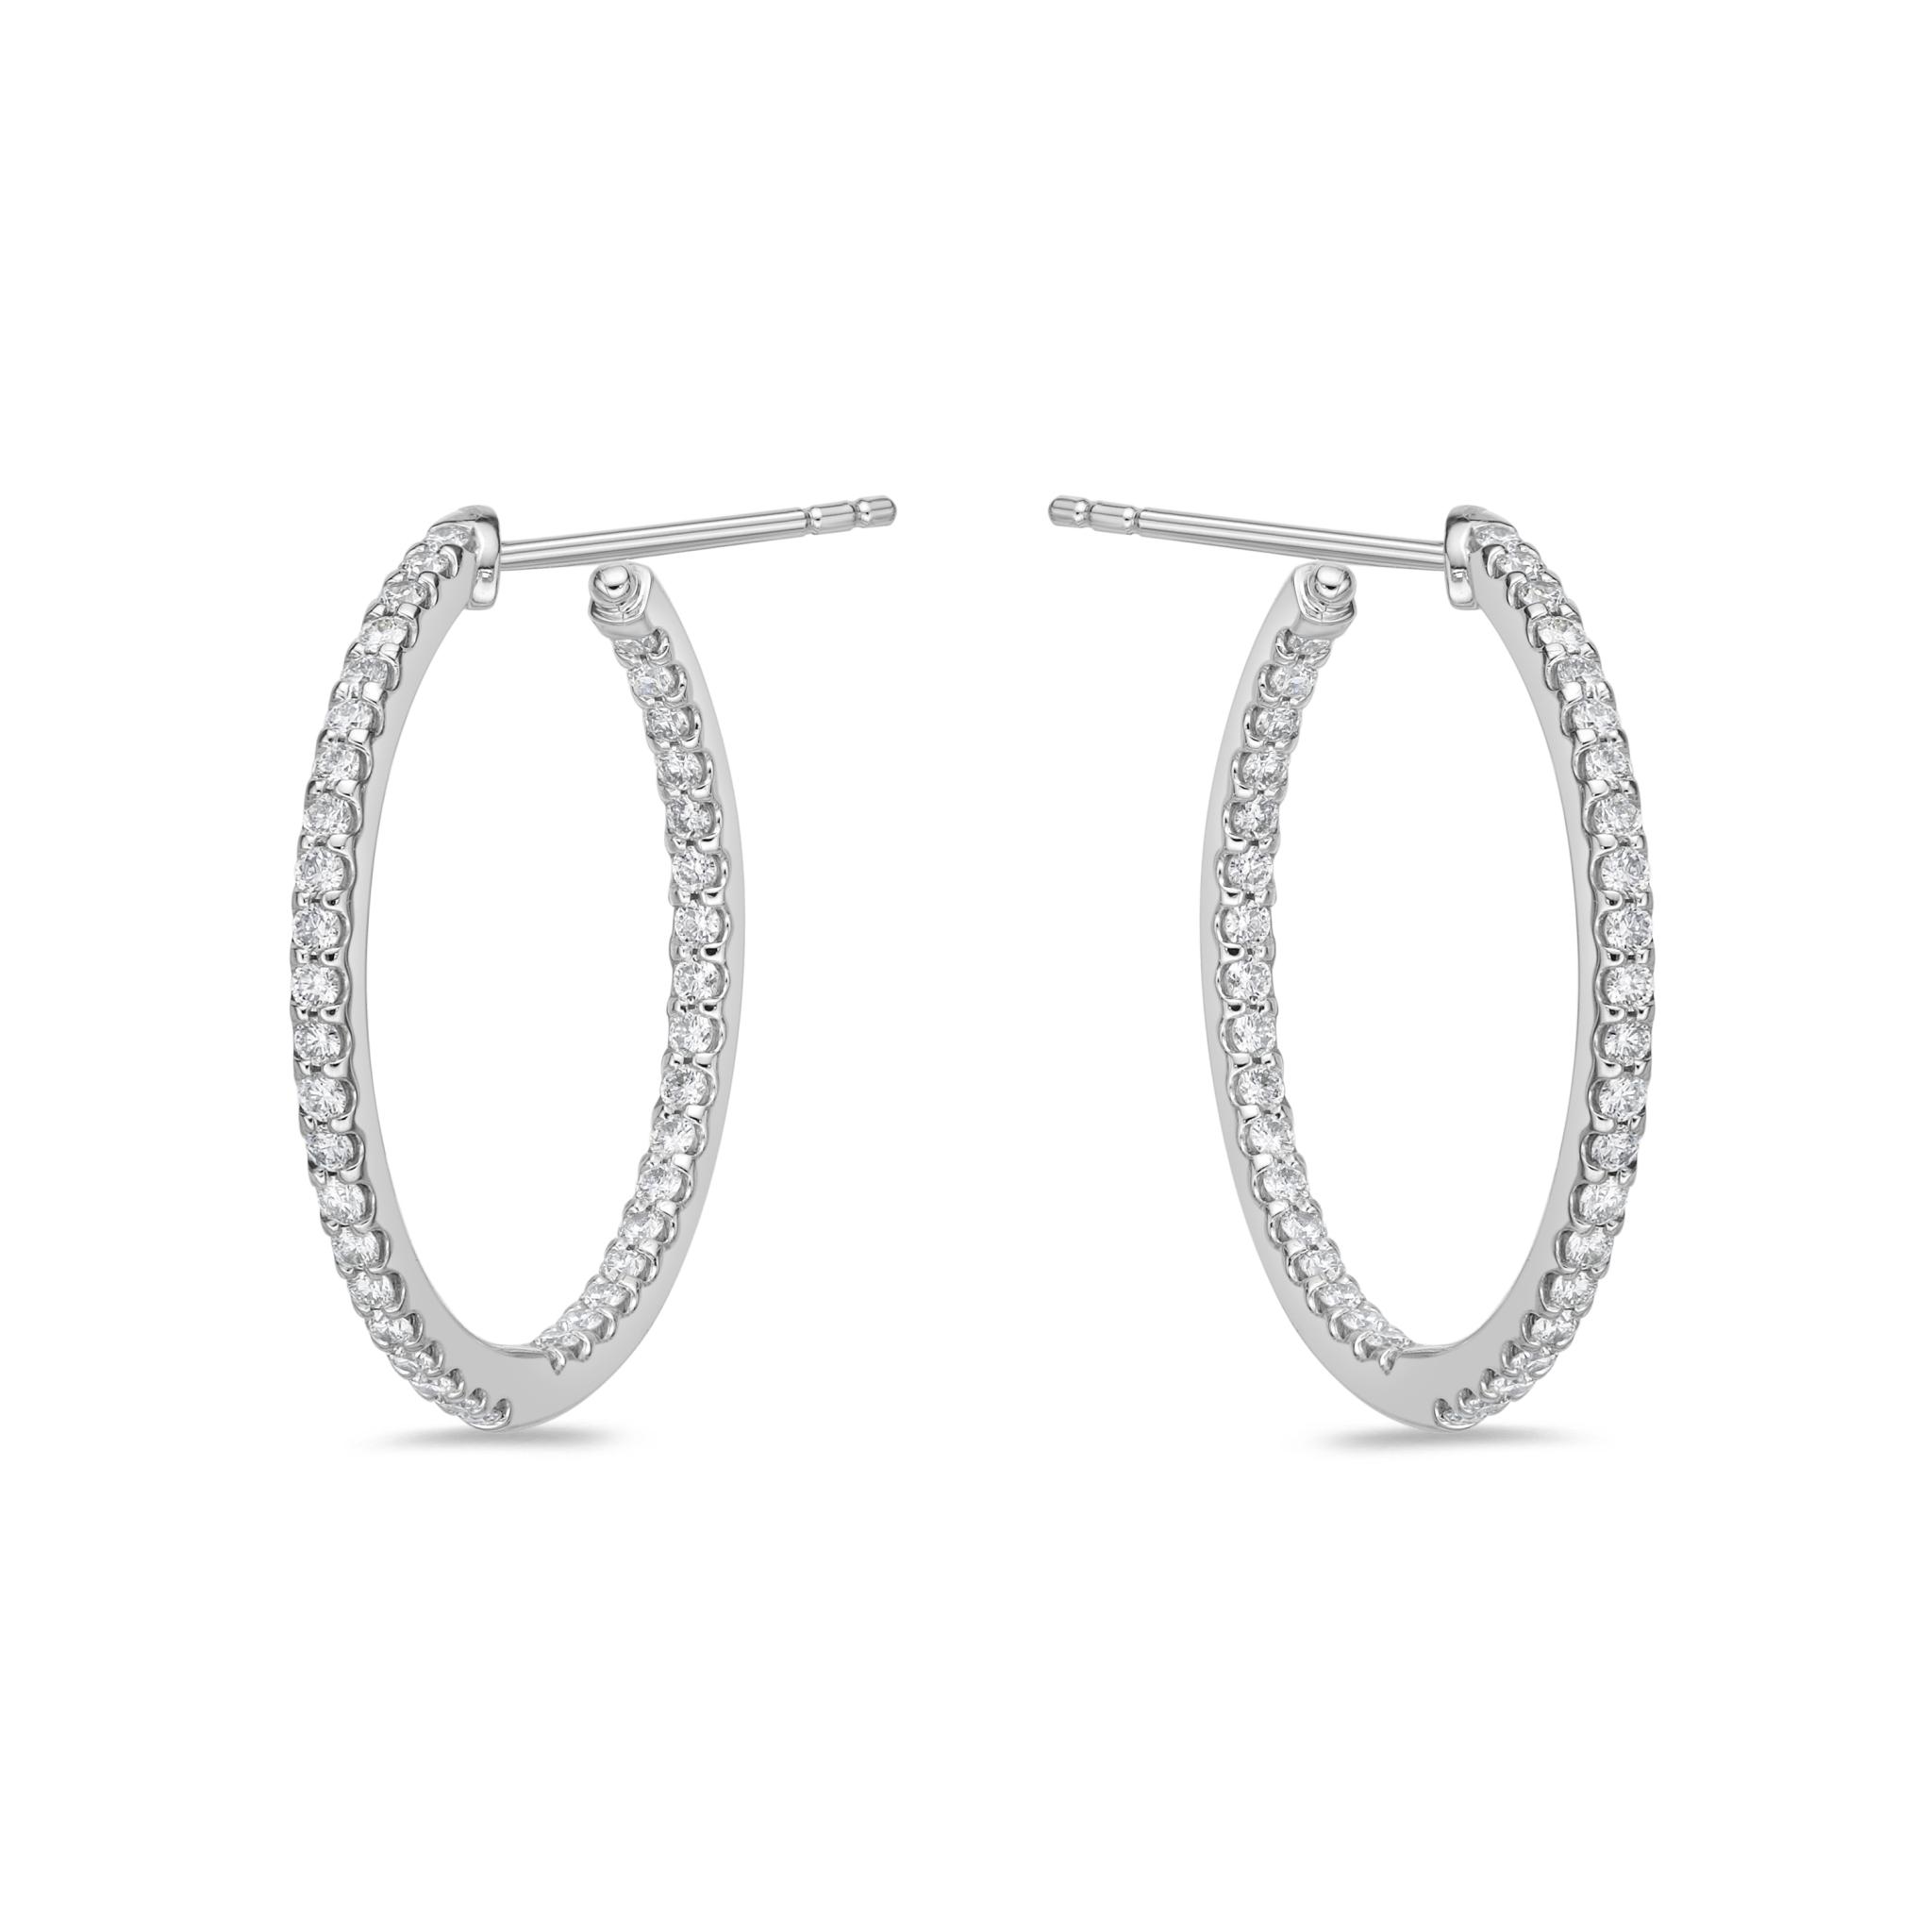 Memoire 18ct White Gold 3/4 Carat Diamond Odessa Hoop Earrings 24x24mm